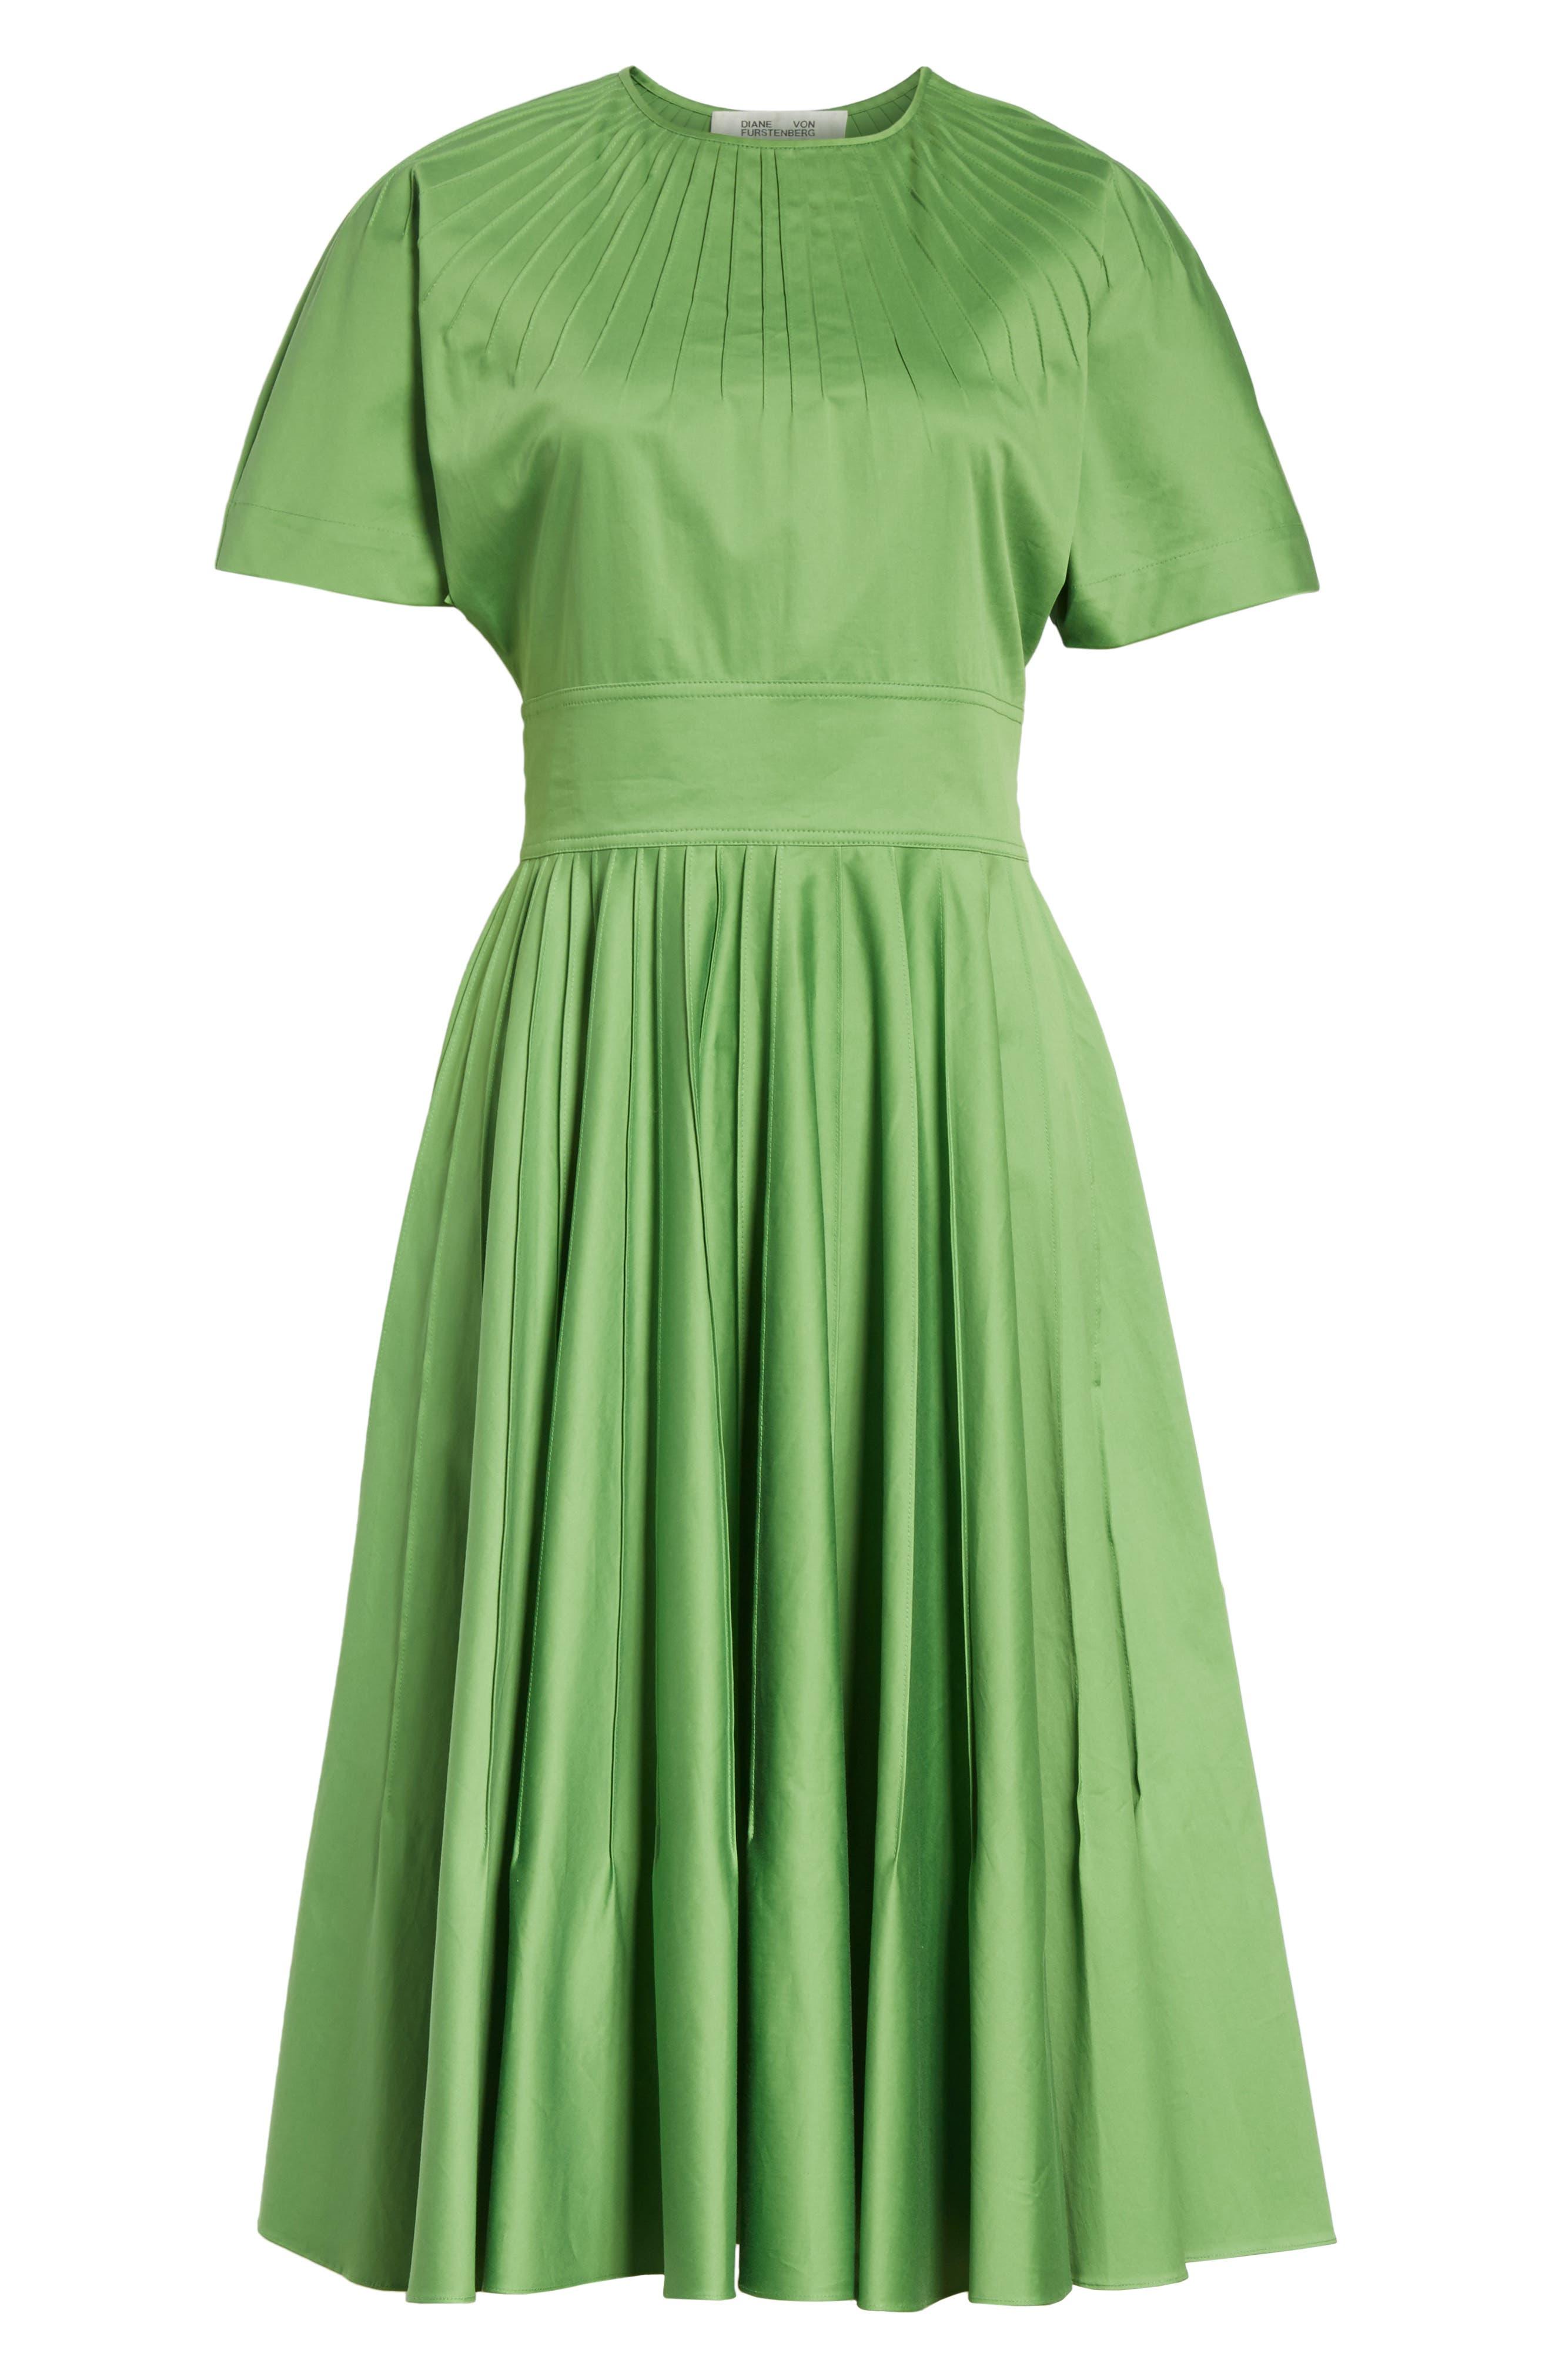 Diane von Furstenberg Pintuck Dress,                             Alternate thumbnail 6, color,                             Grass